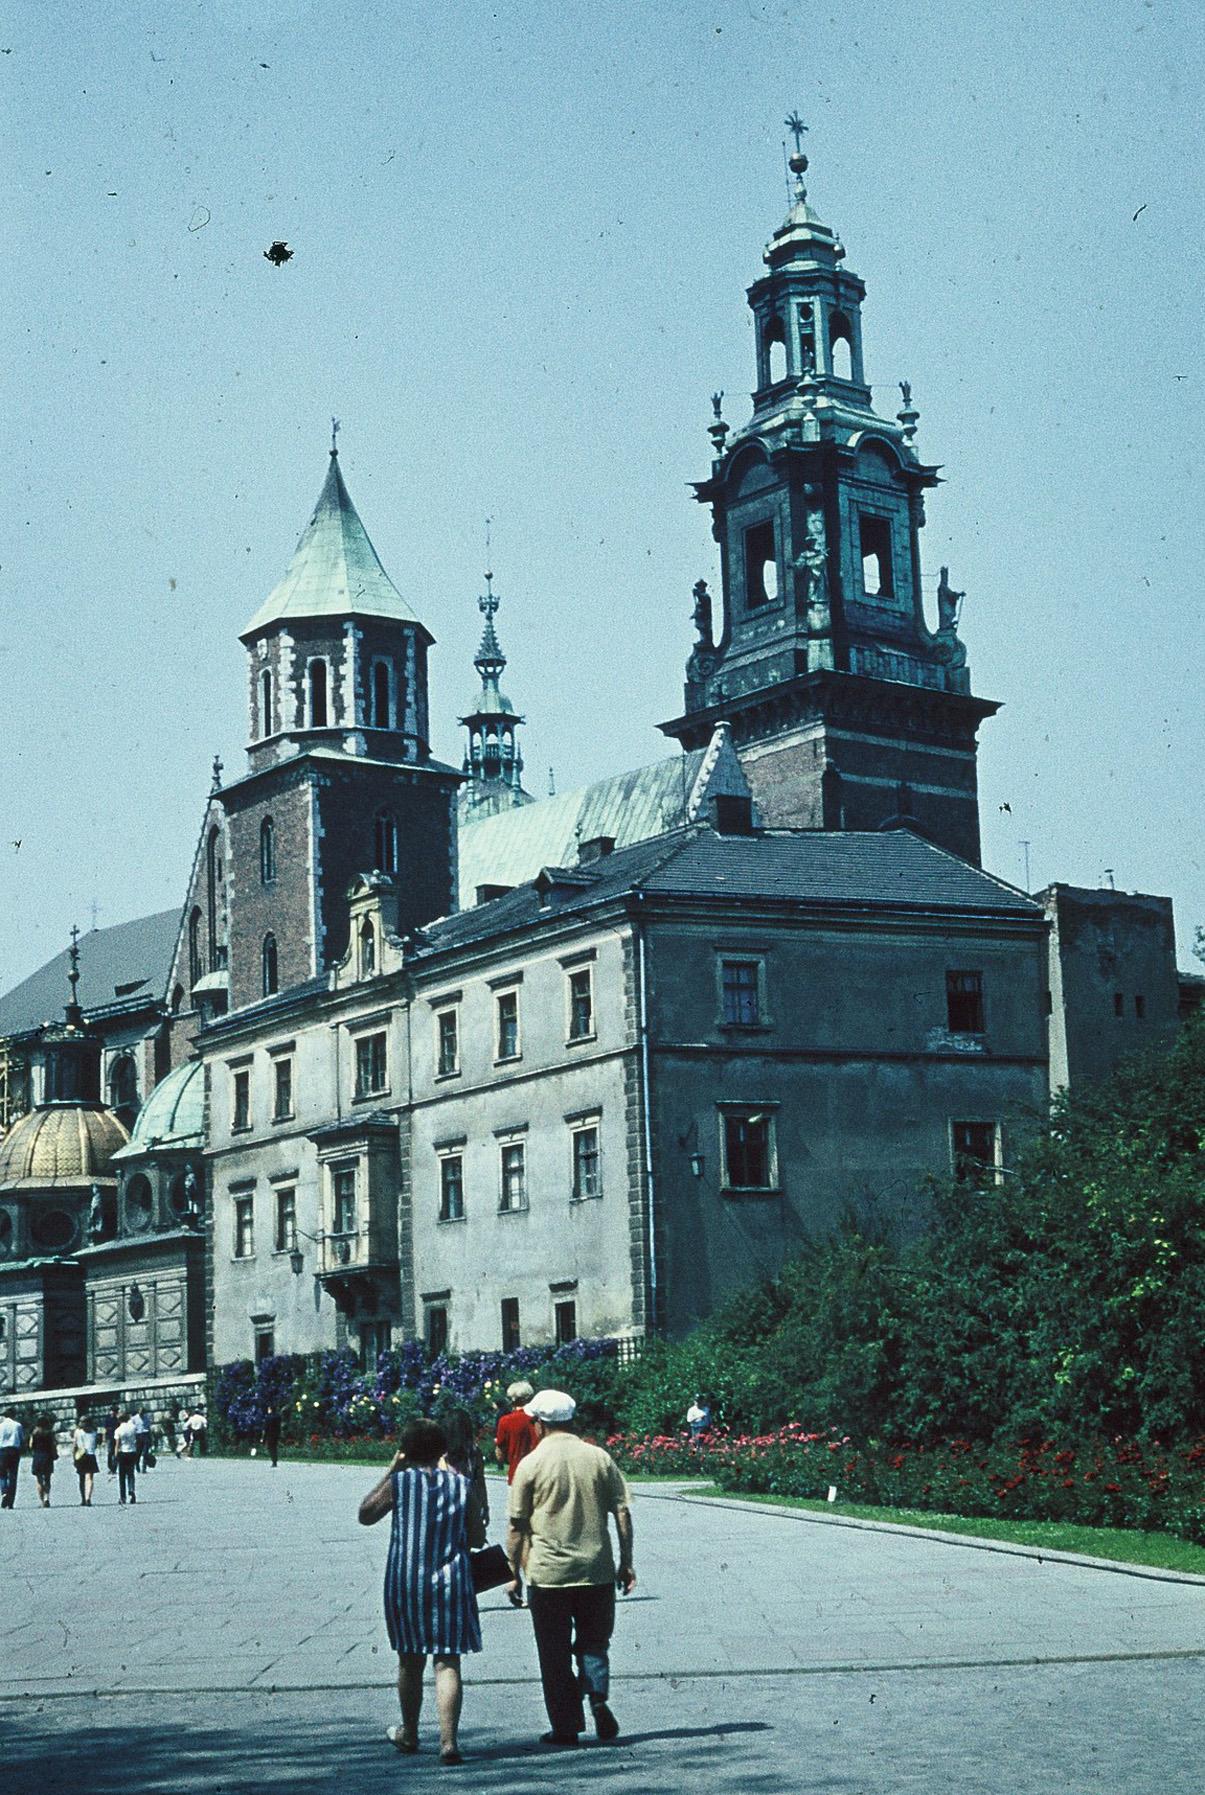 die Wawel (ehem. Königsschloss)